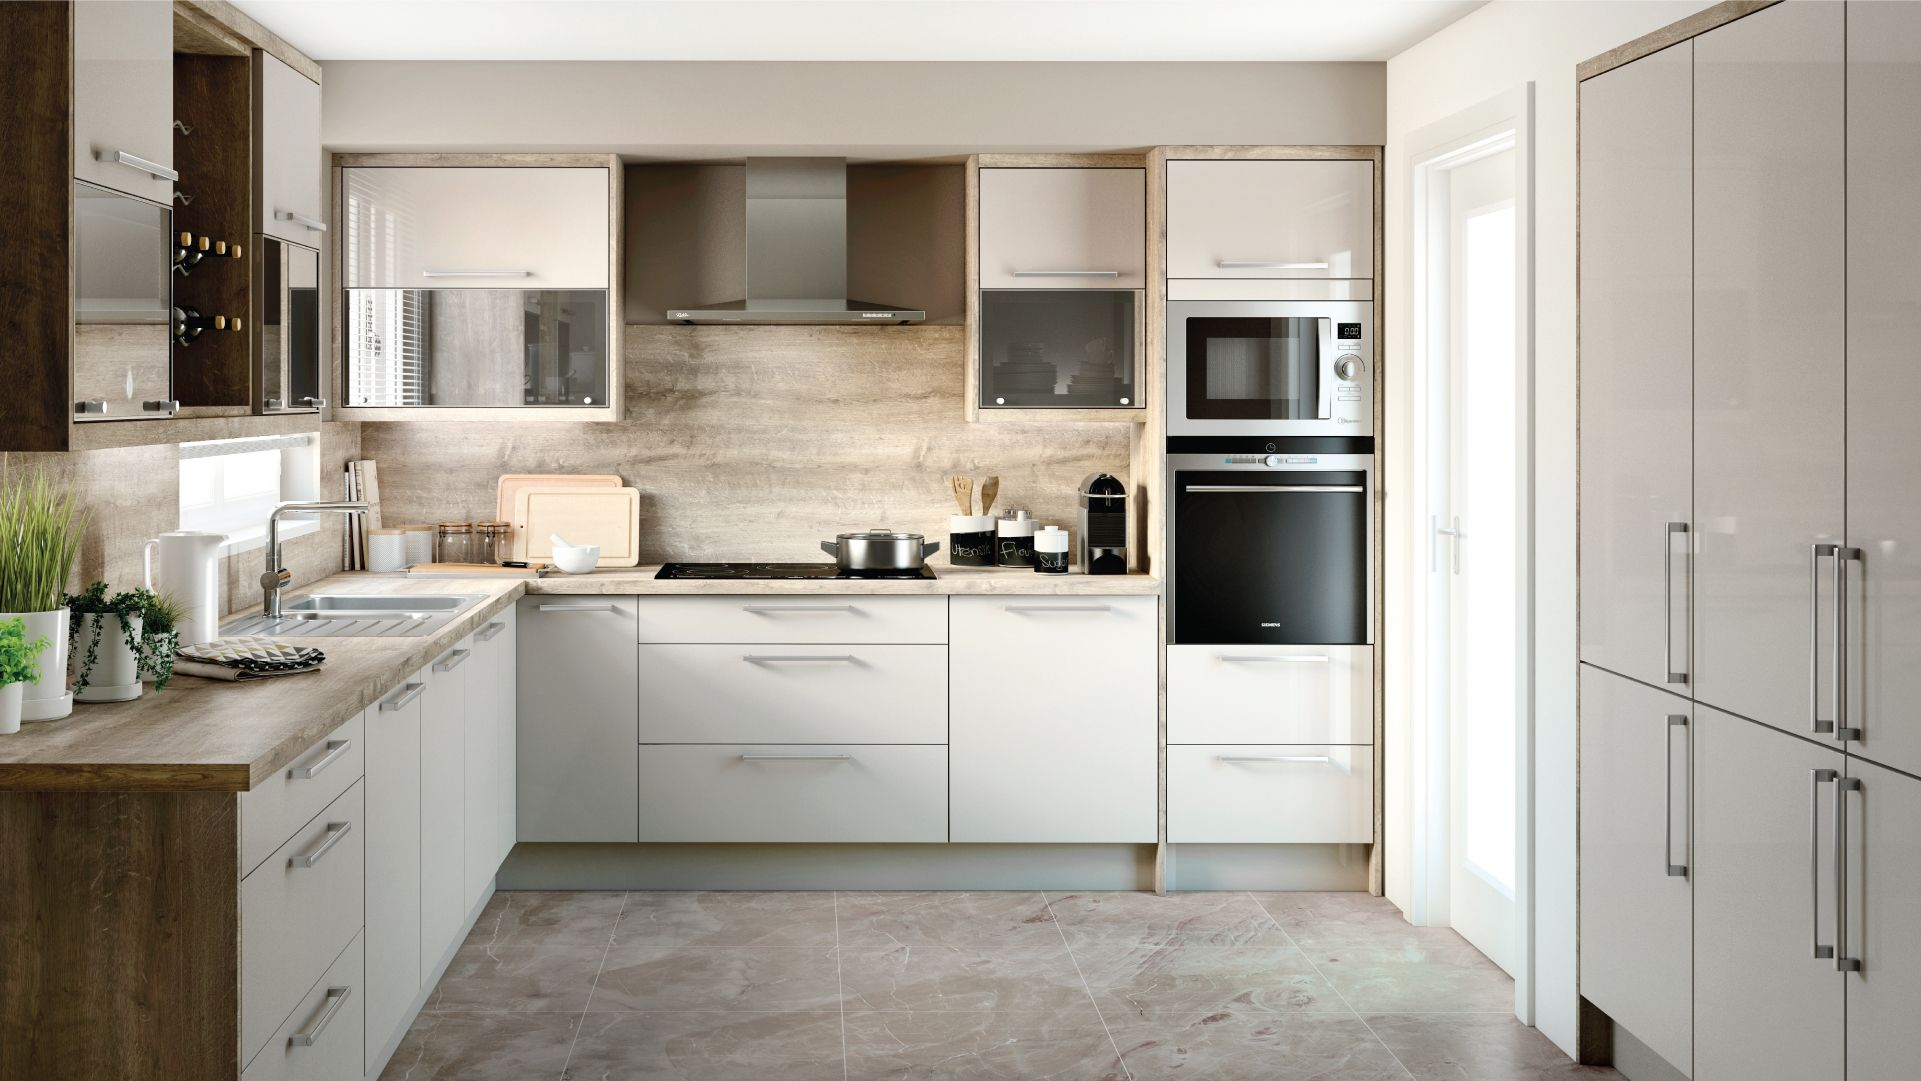 Beverly Kitchen Kitchen fittings, Kitchen, Kitchen meaning